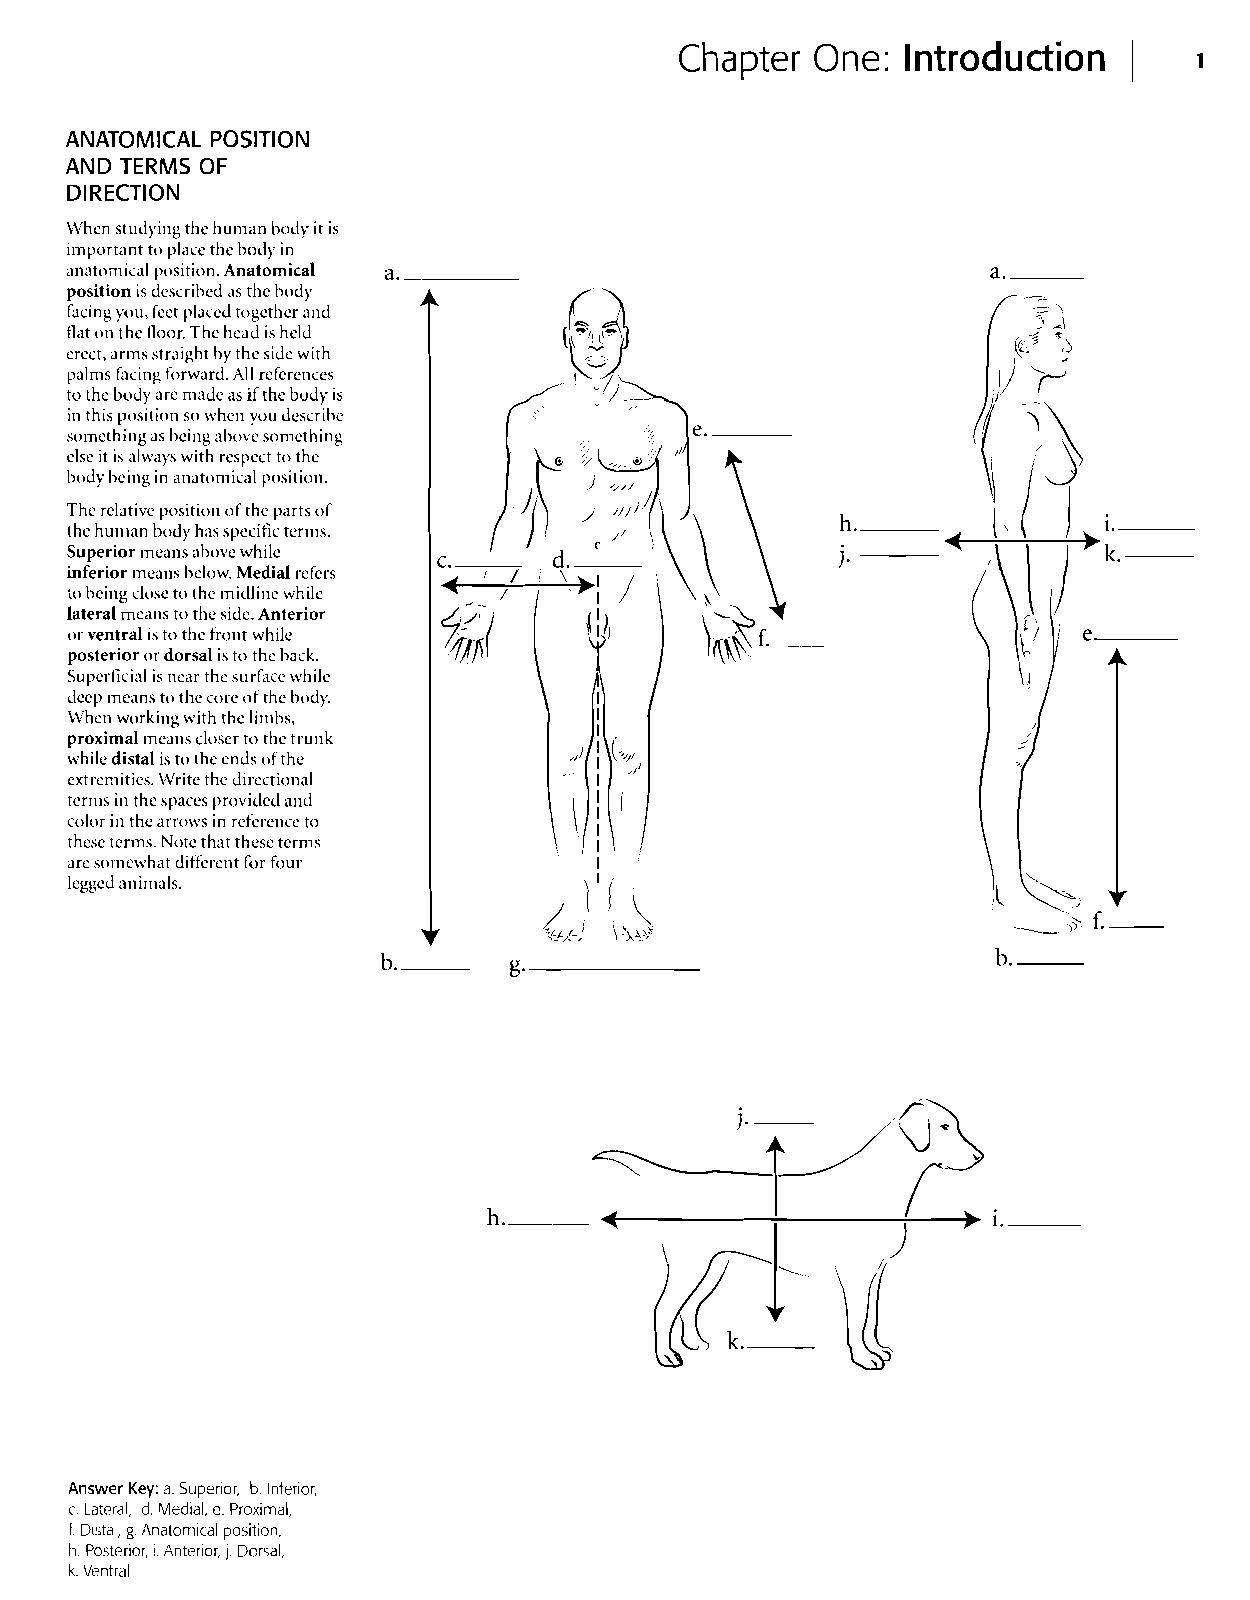 Kaplan Anatomy Coloring Book.pdf | Anatomy coloring book ...